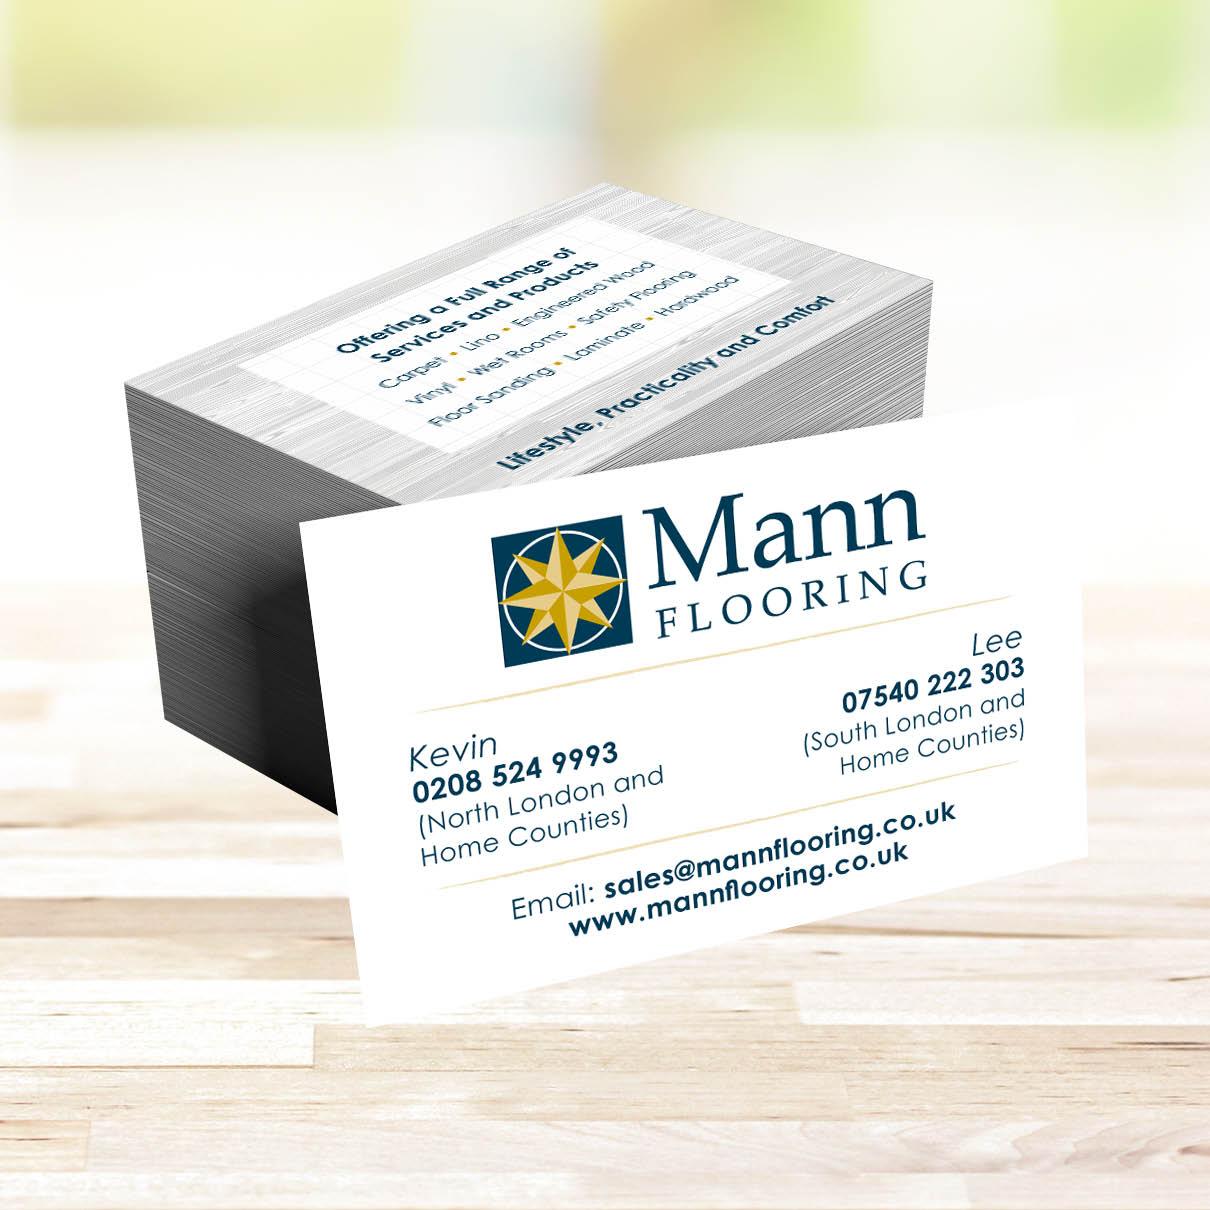 Mann-Flooring-BC...